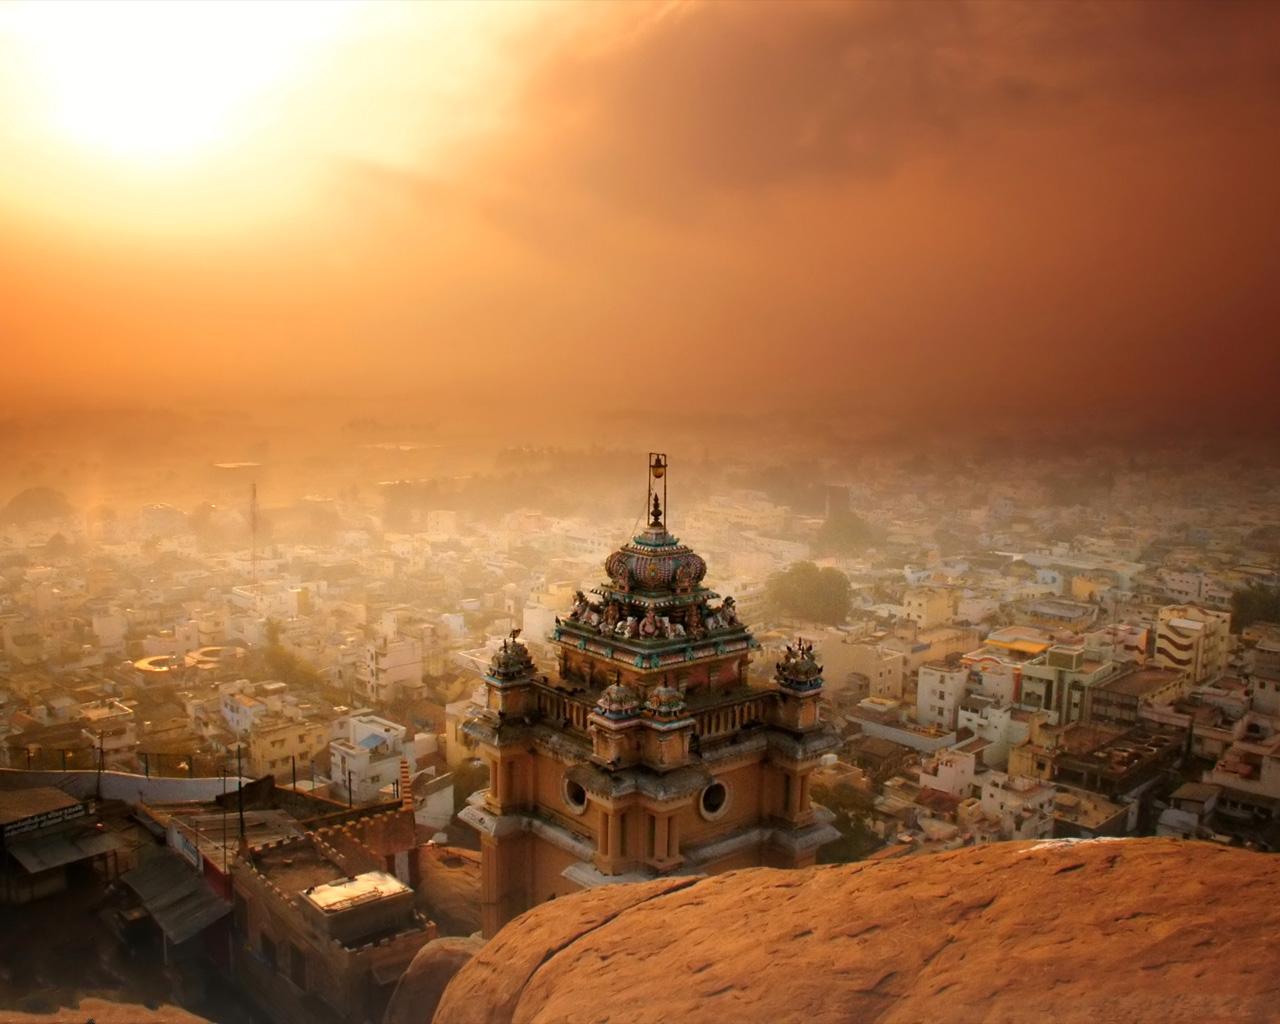 Incredible India wallpapers hd   India wallpaper hd   HD widescreen 1280x1024